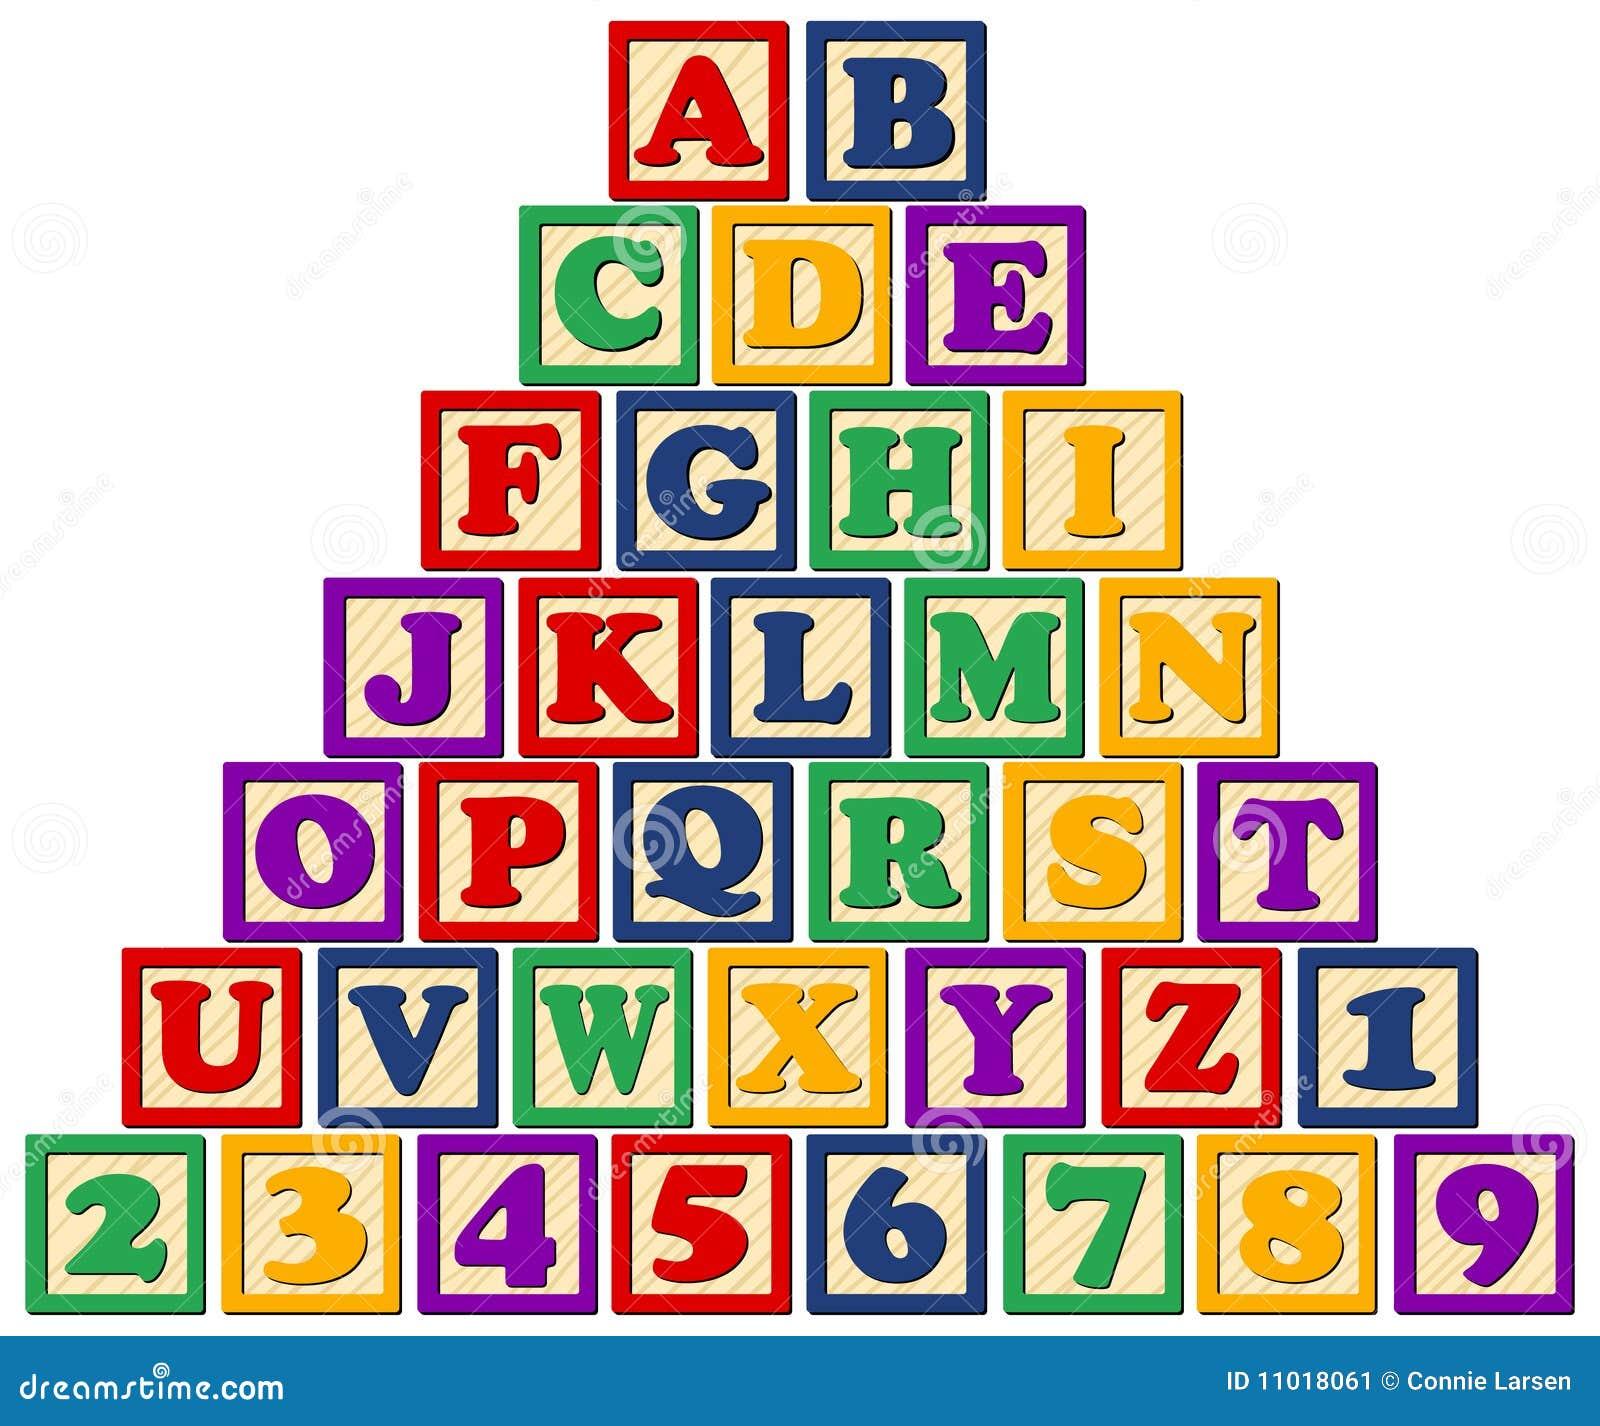 displaying 20 images for wooden alphabet blocks font